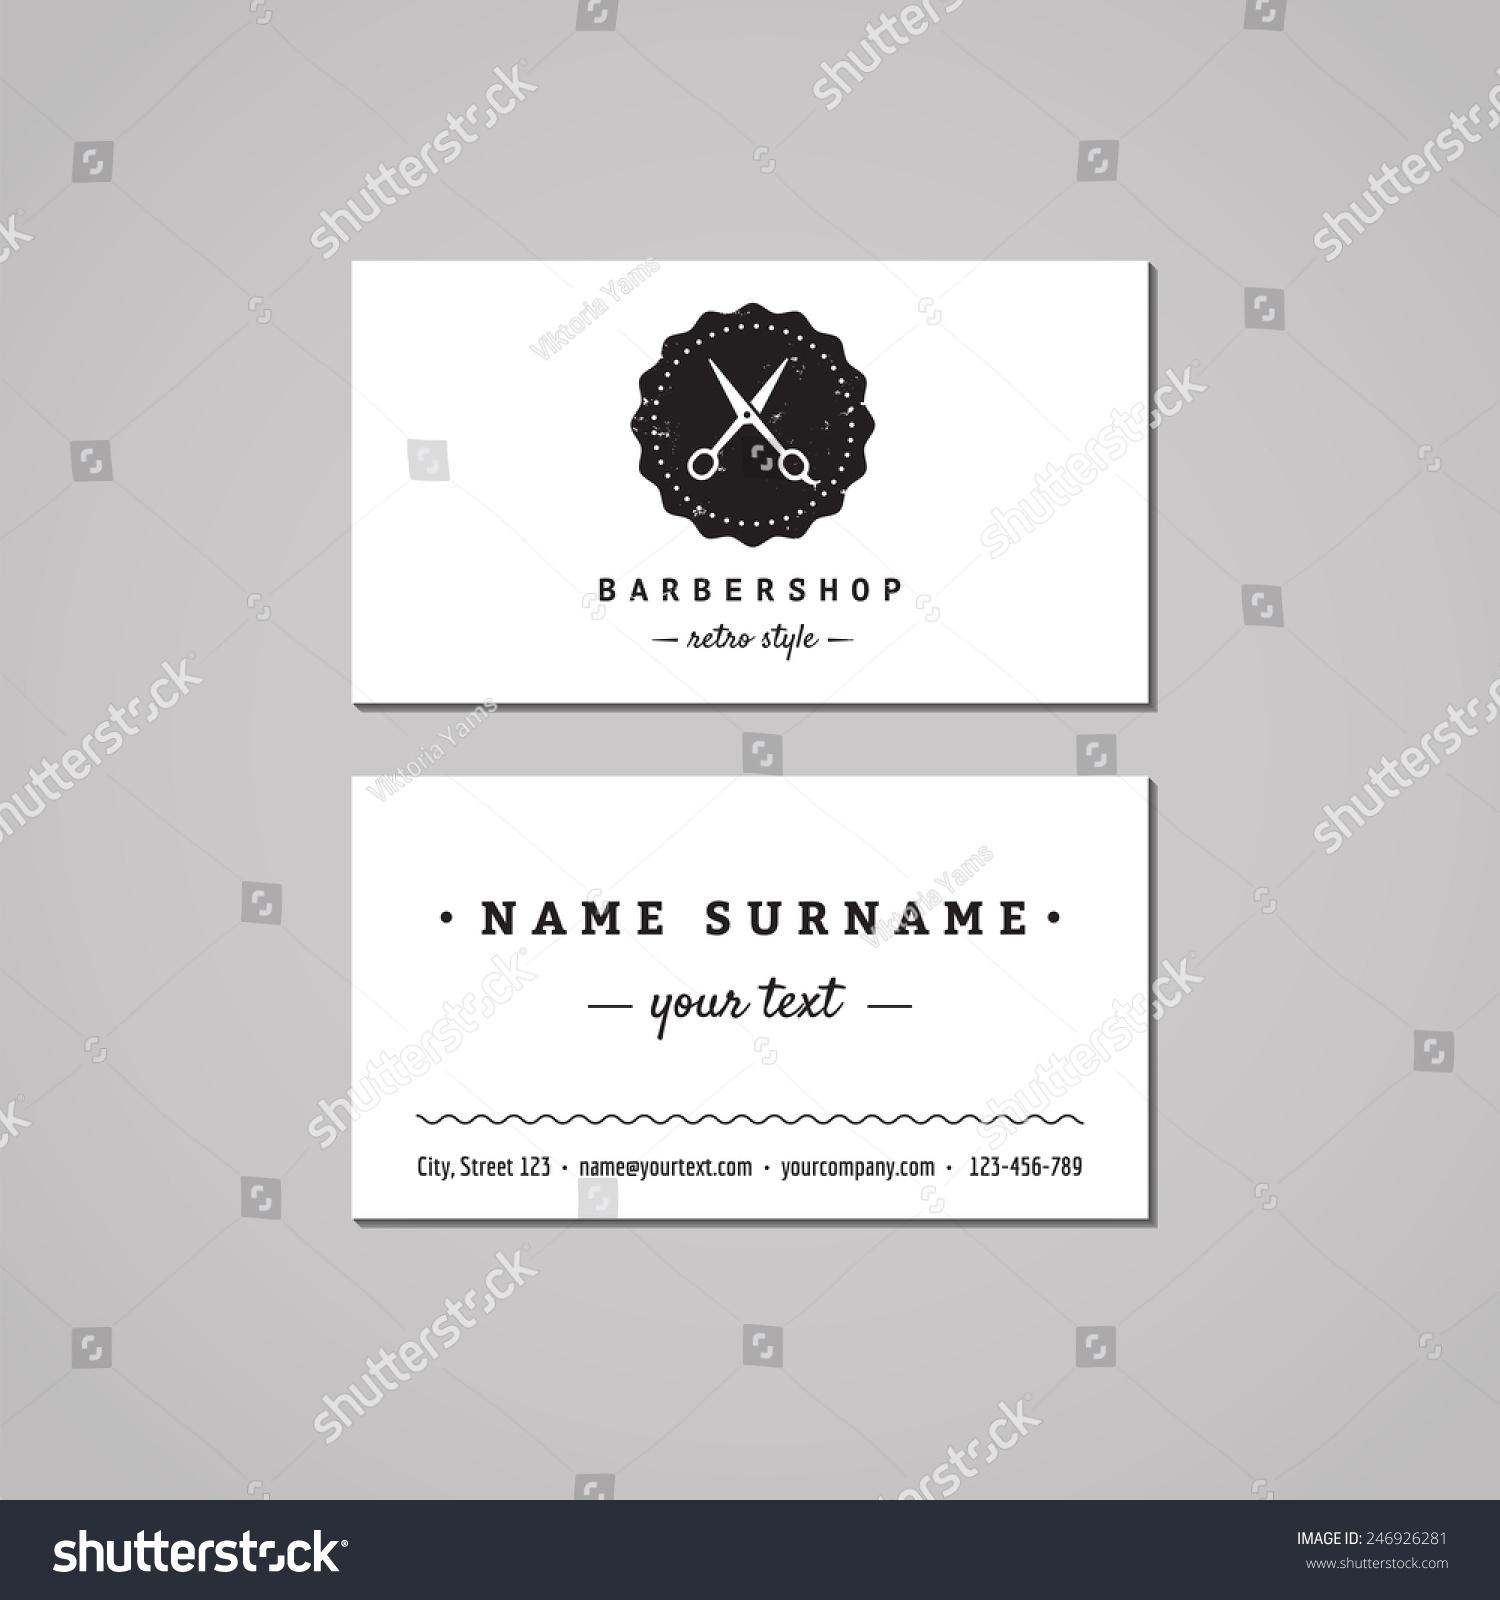 Barbershop Hair Salon Business Card Design Stock Vector 246926281 ...